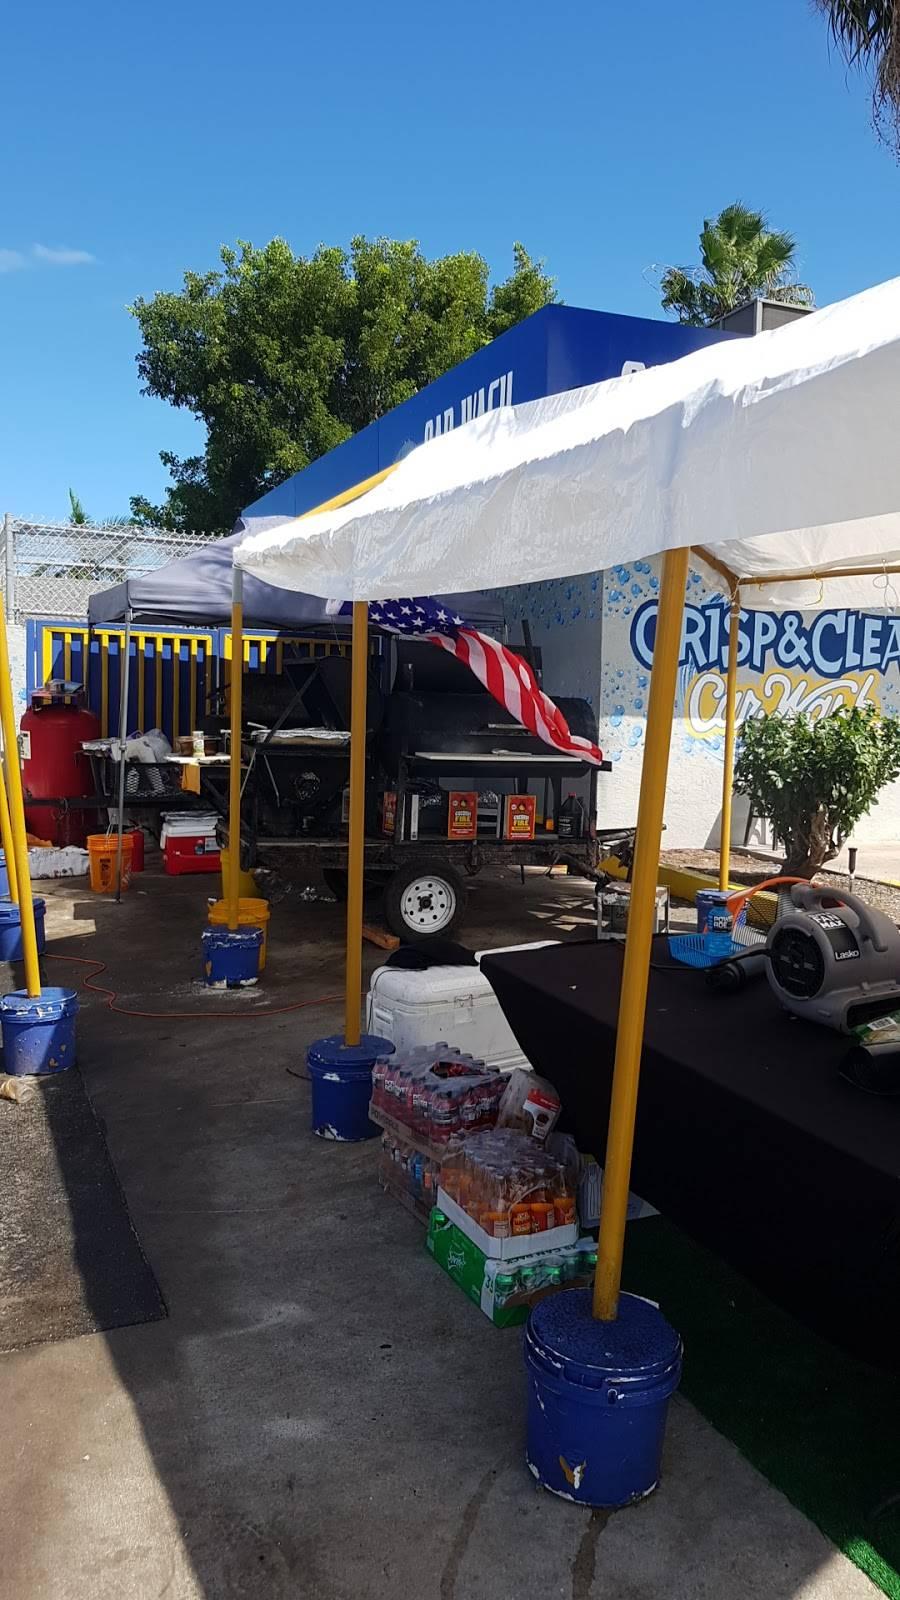 Chefsfull - restaurant  | Photo 3 of 4 | Address: Goulds, FL 33170, USA | Phone: (786) 227-9275